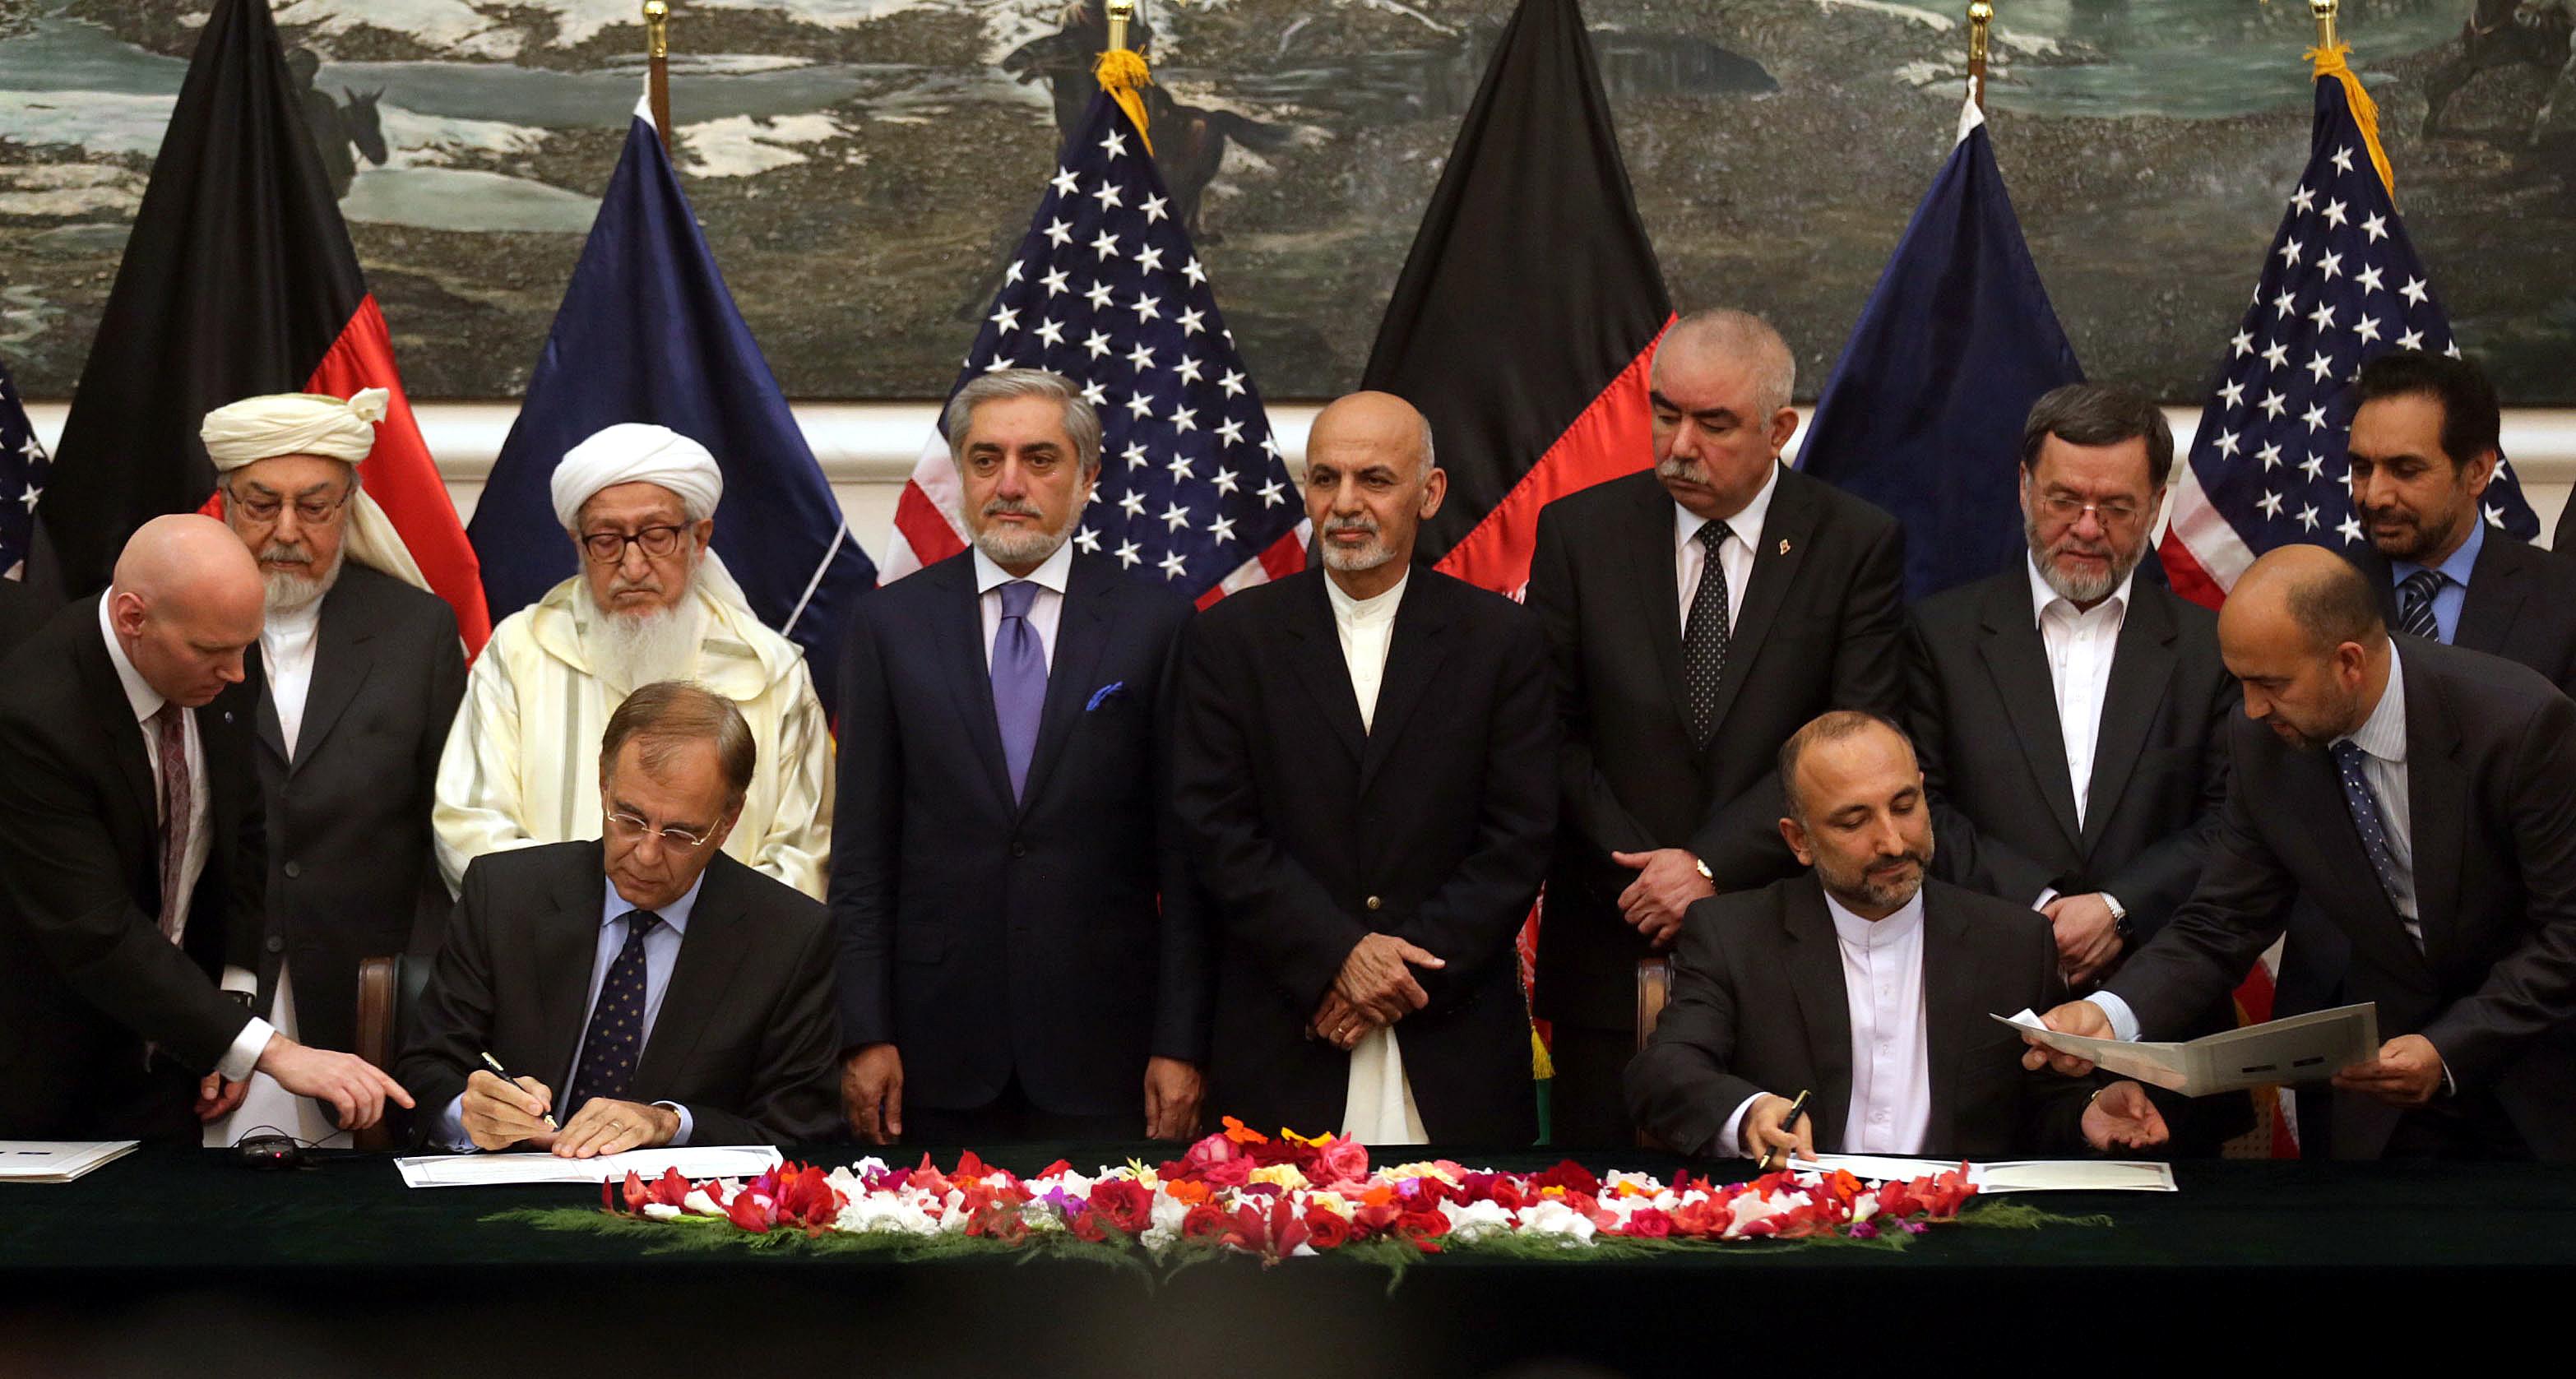 Nato Sofa Afghanistan Mjob Blog : h51594720 from m-jobcn.com size 3132 x 1677 jpeg 3131kB